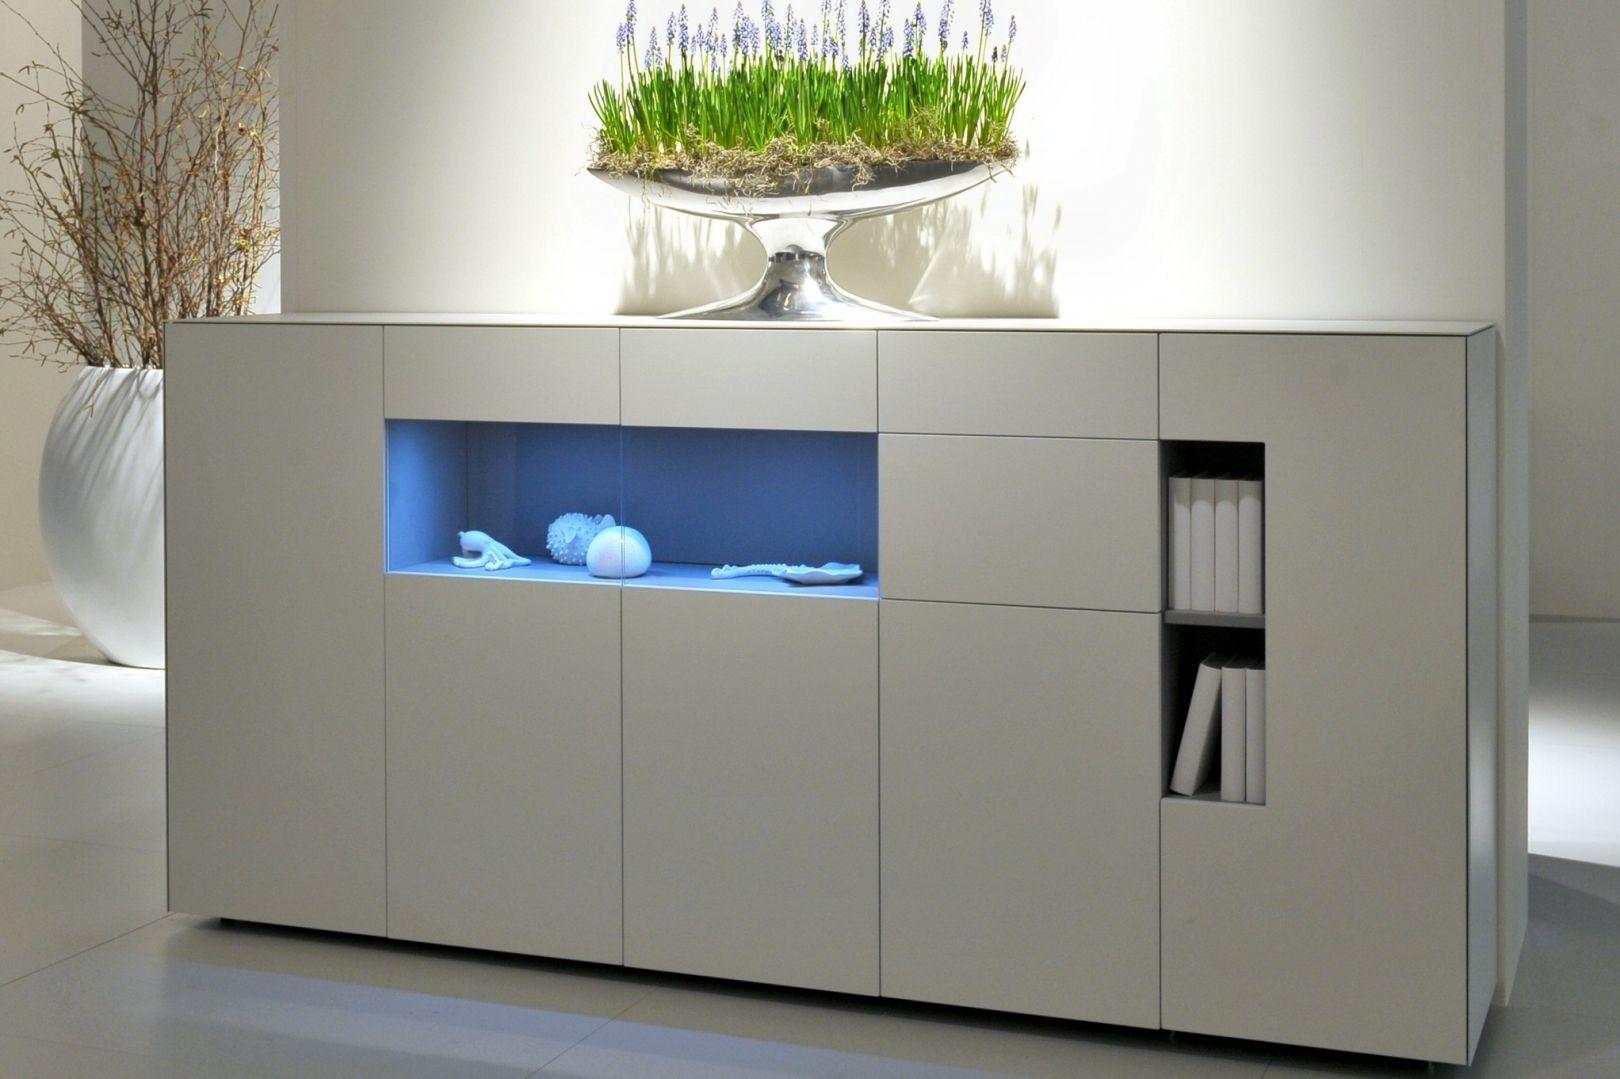 Design Kast Woonkamer : Halfhoge kast woonkamer naar keuze in te delen kasten